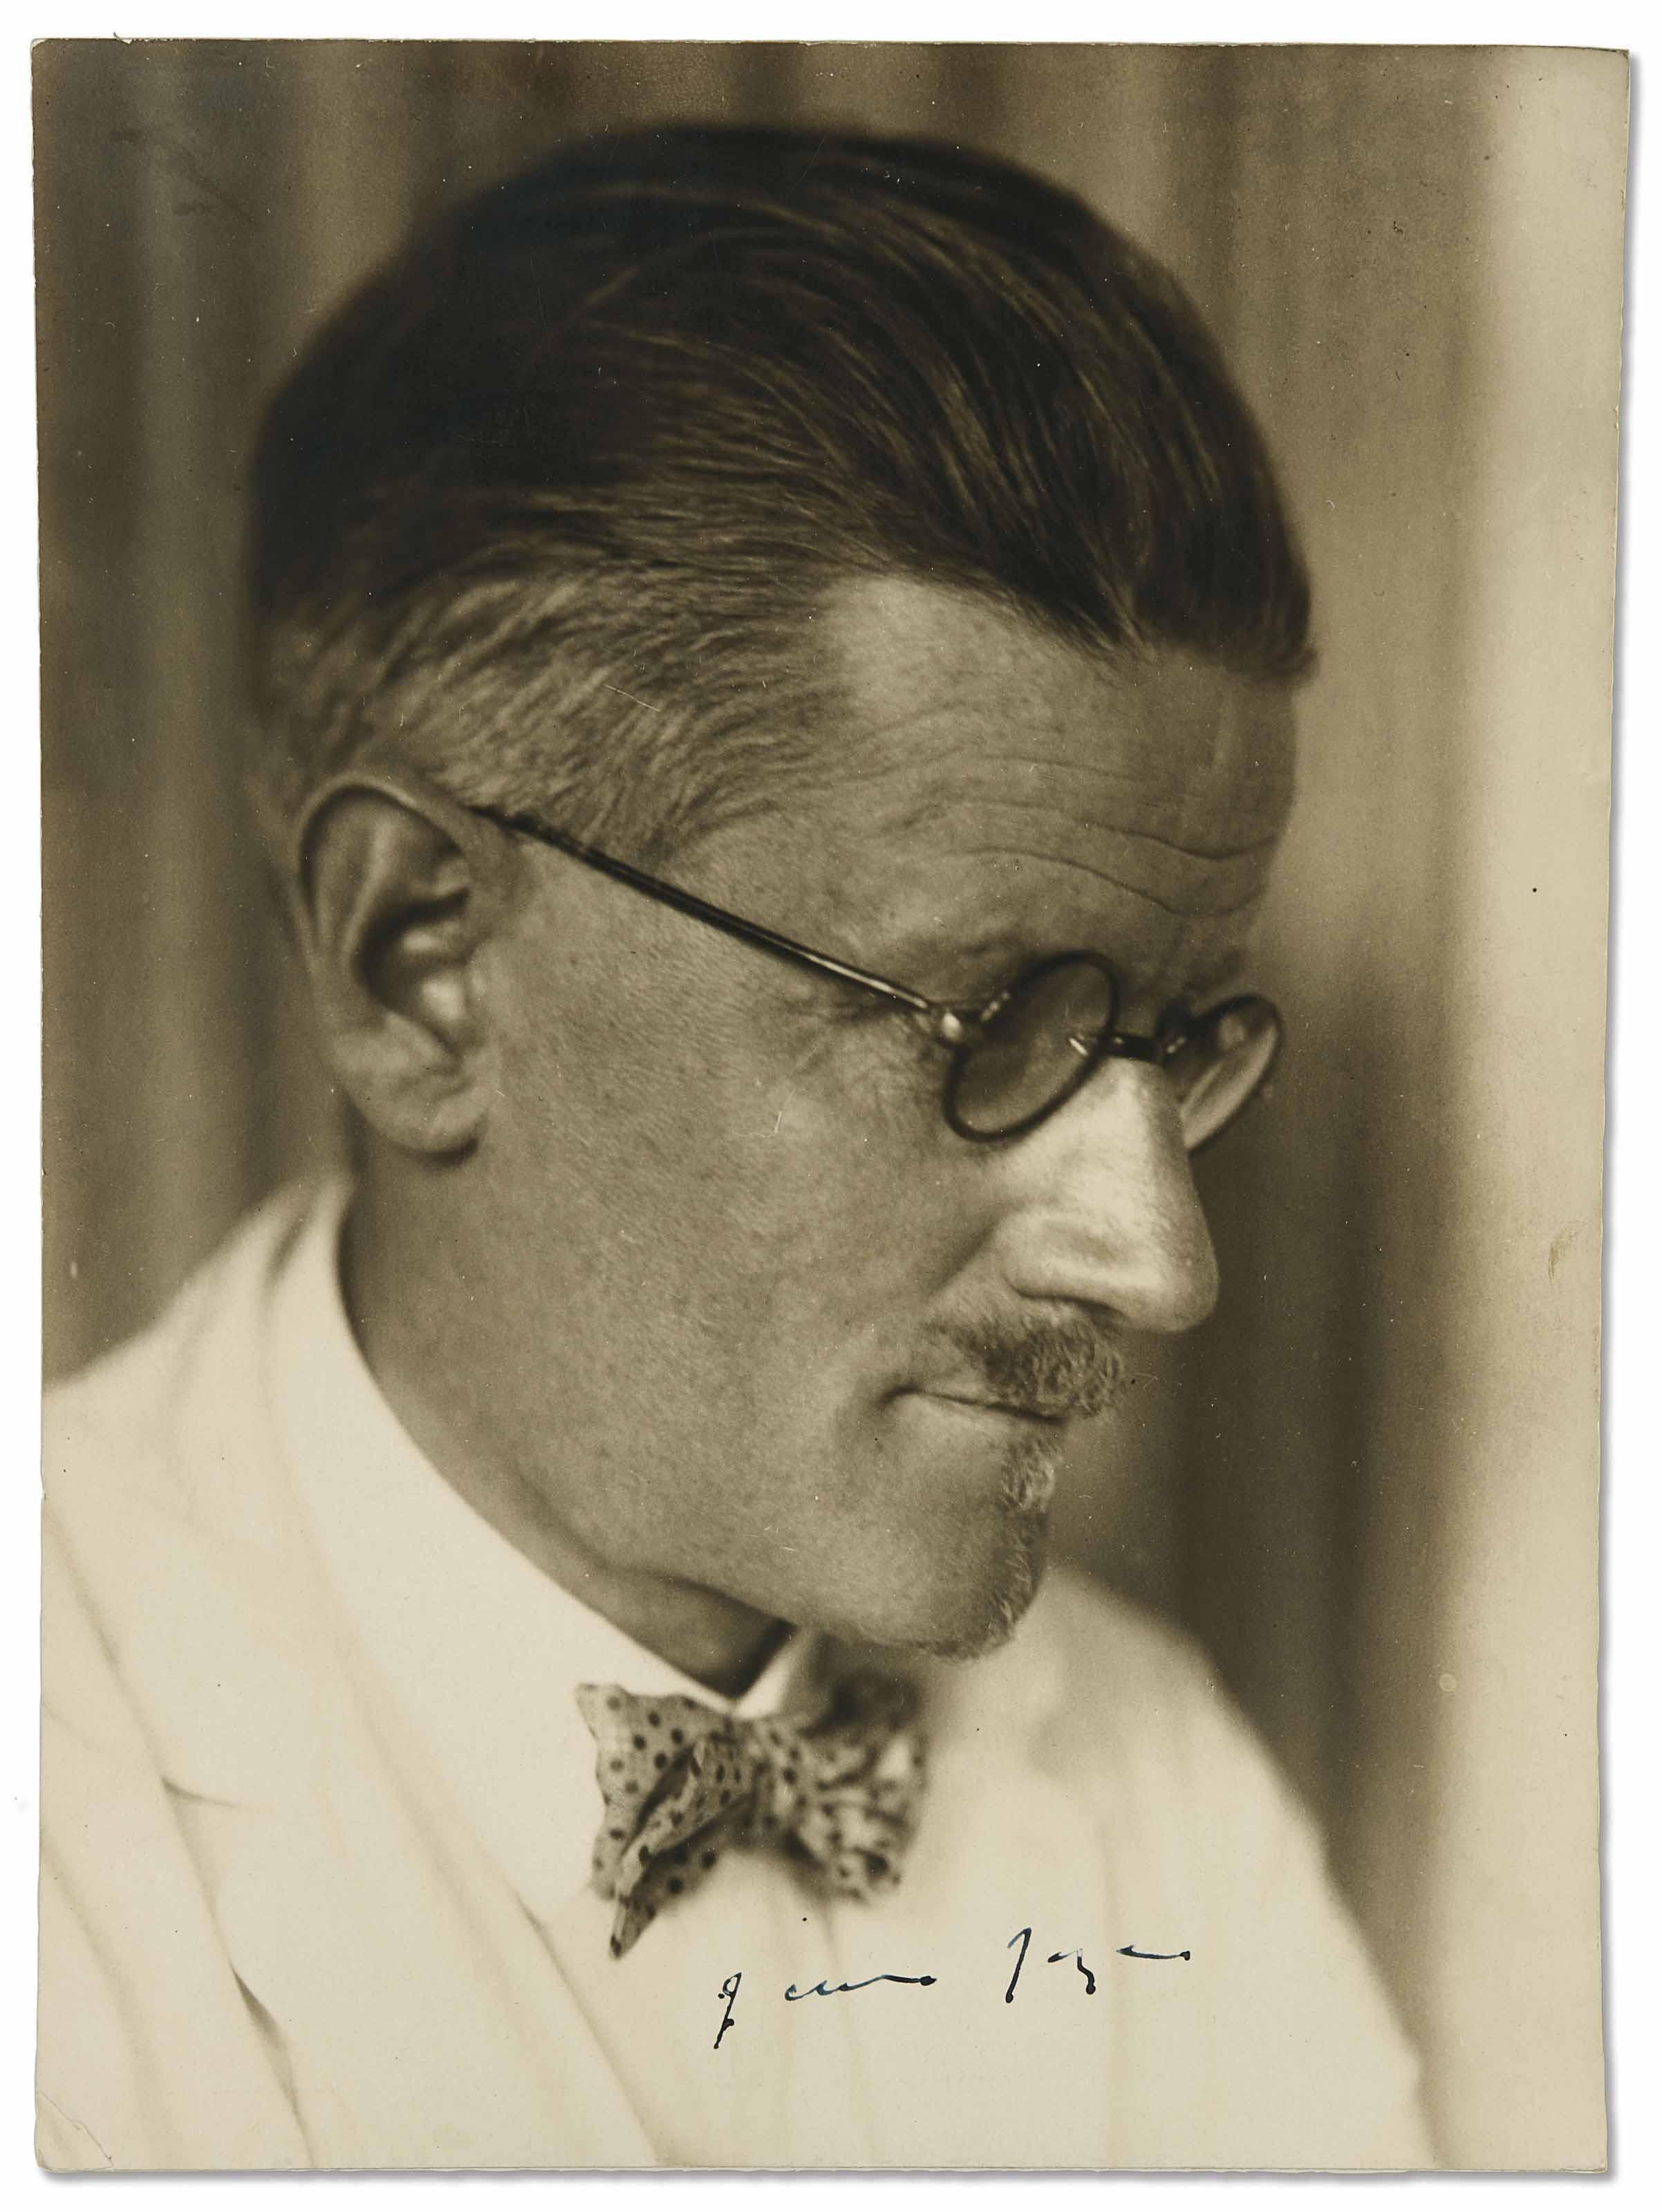 JOYCE, James (1882-1941) Port